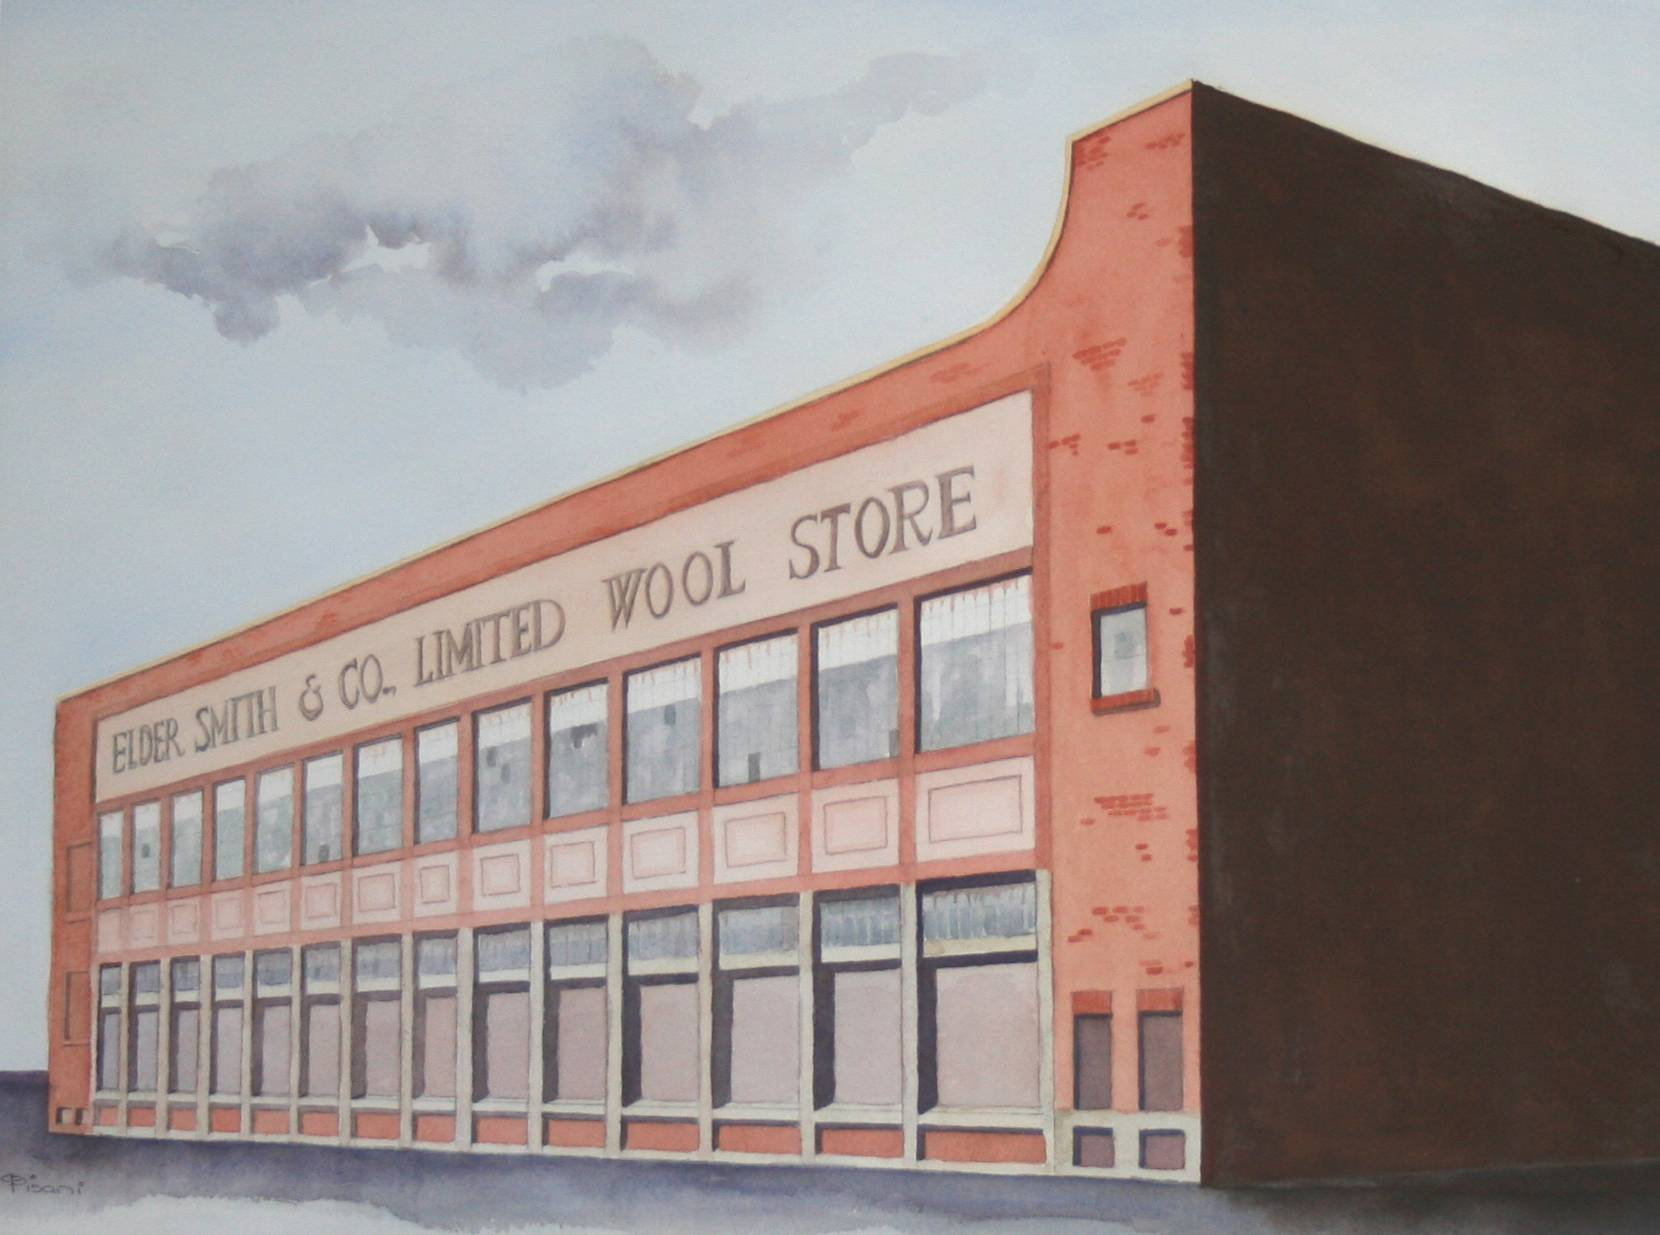 Elder Smith Wool Stores Port Adelaide I/D 514D